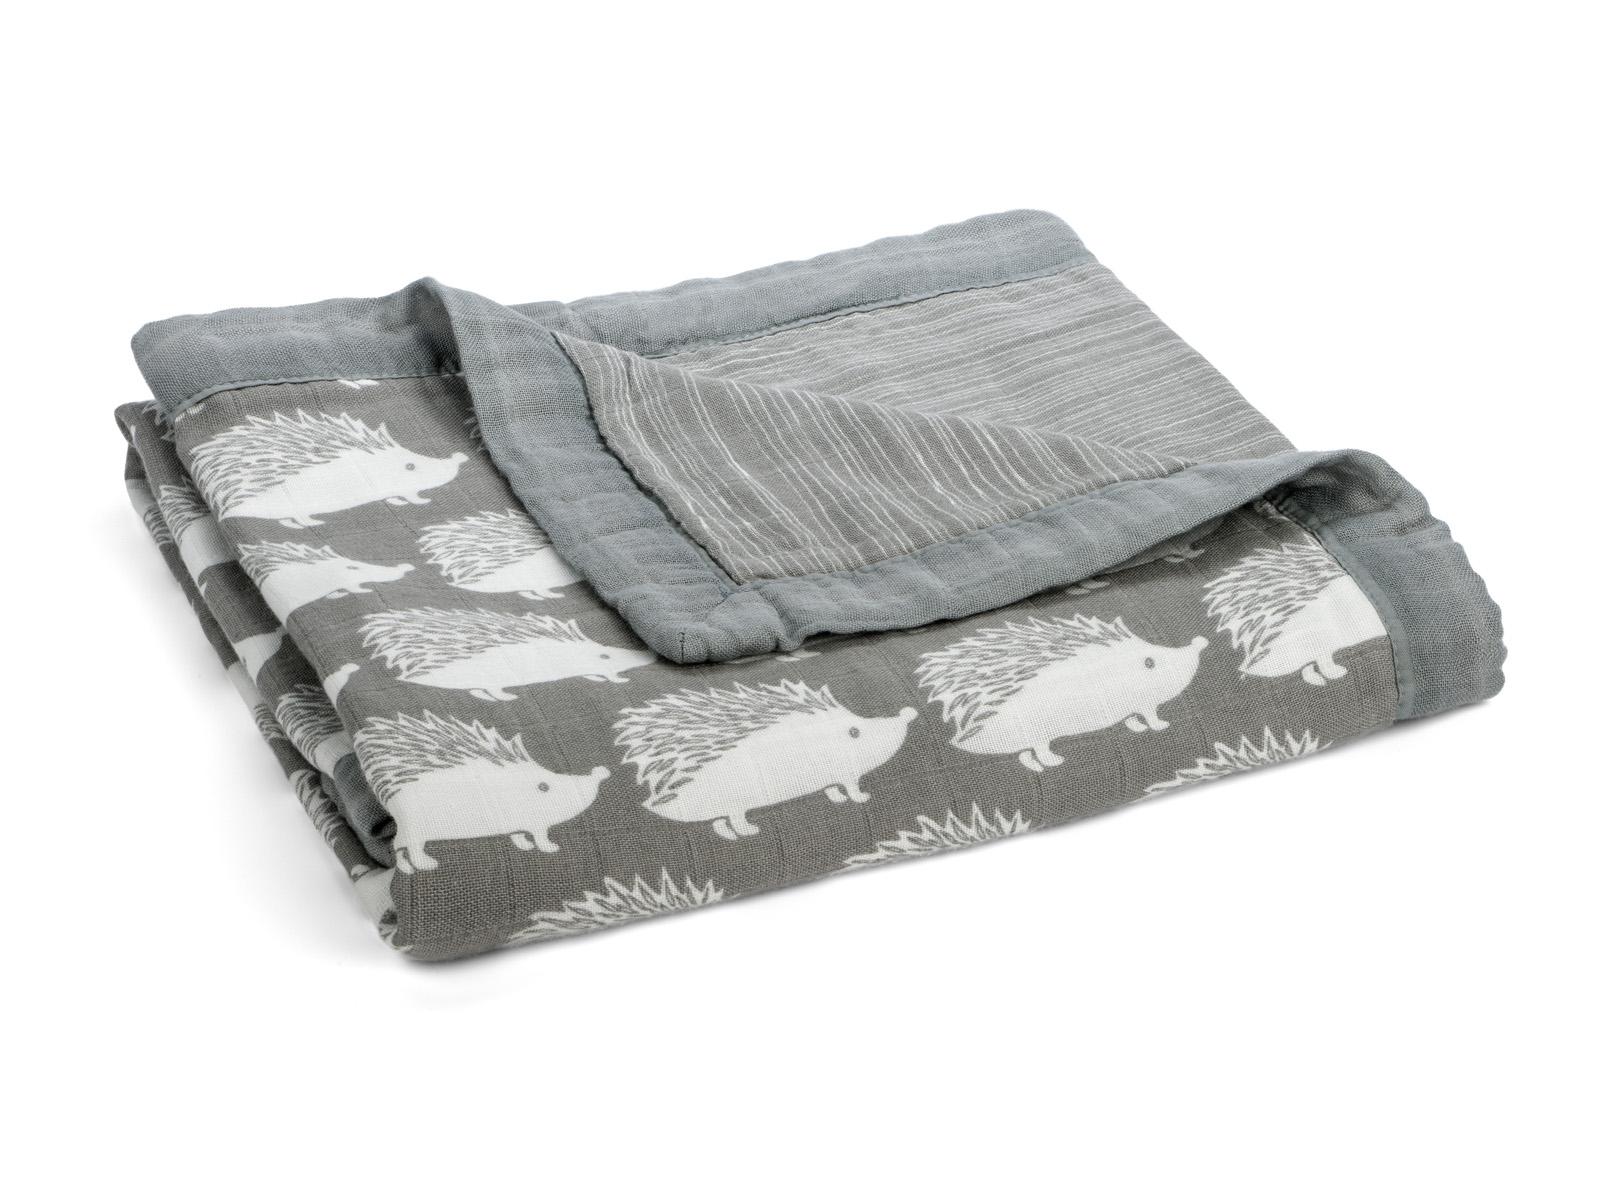 milkbarn big lovey baby kuscheldecke babydecke 90 x 90 cm igel grau. Black Bedroom Furniture Sets. Home Design Ideas